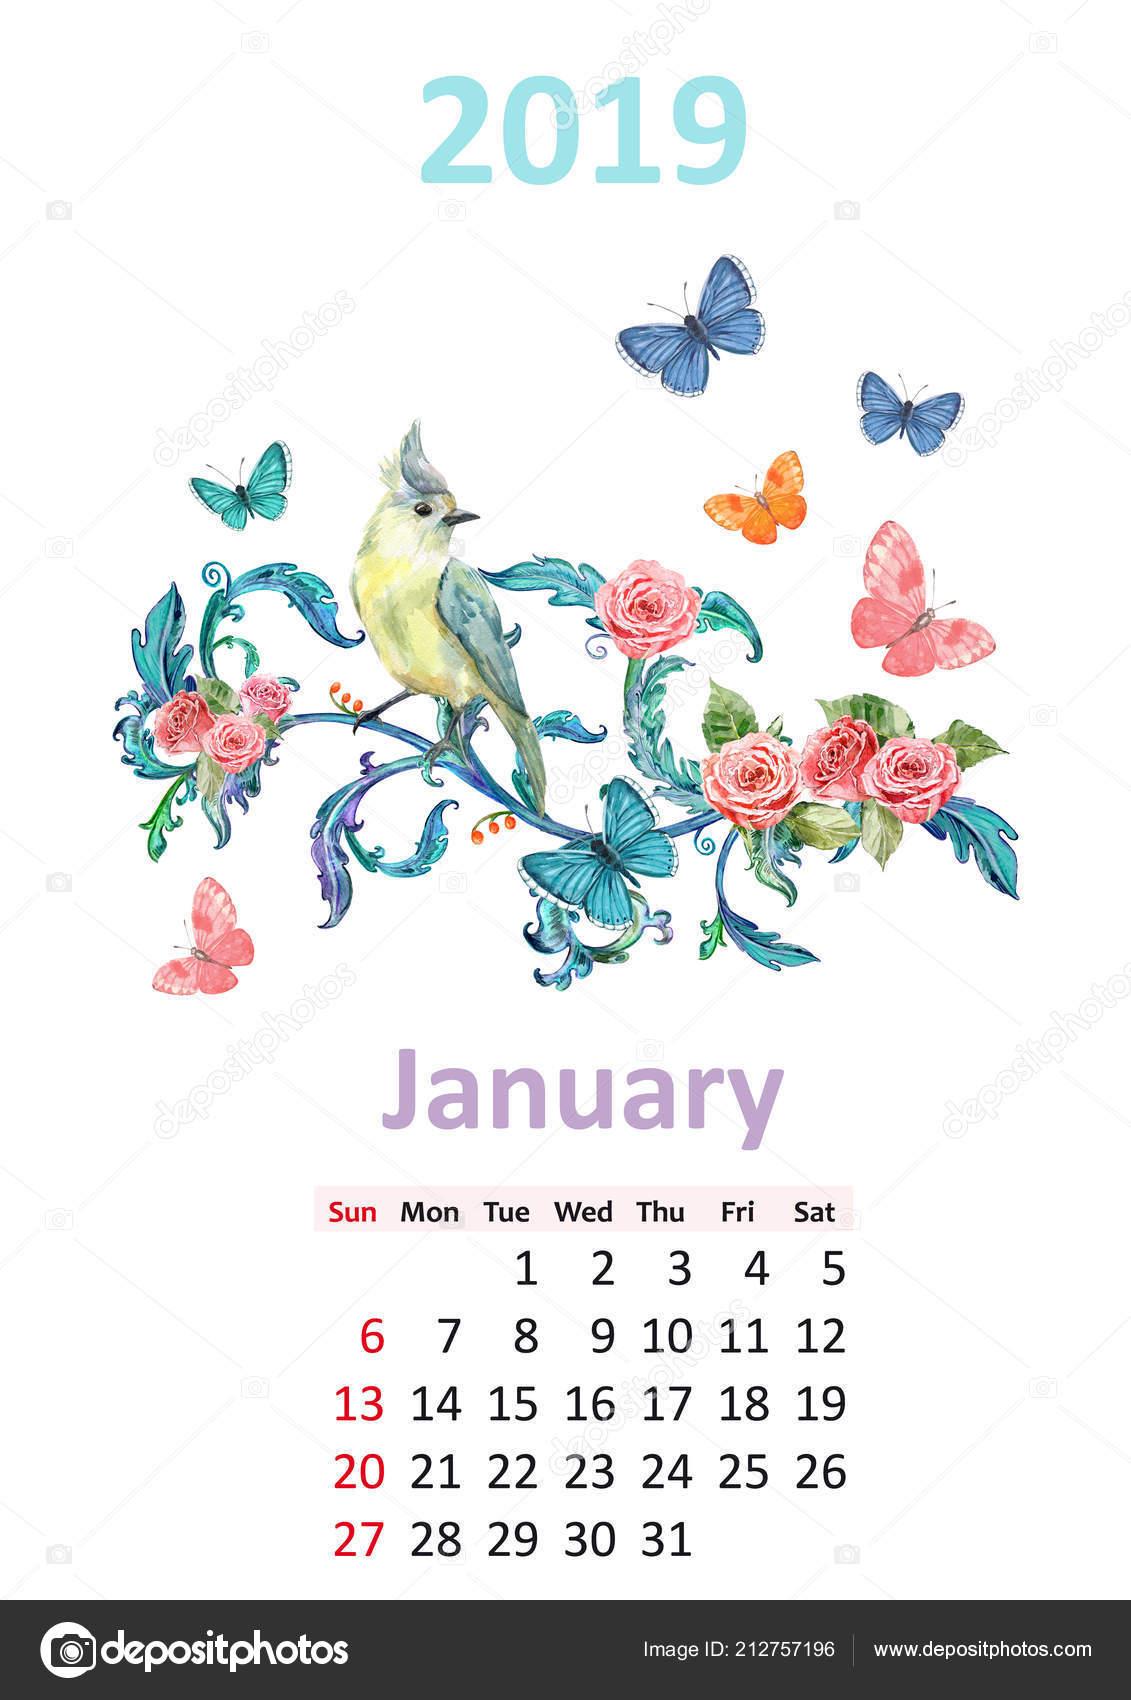 Calendario Enero 2019 Floral Romántico Con Mariposas Aves Sentado